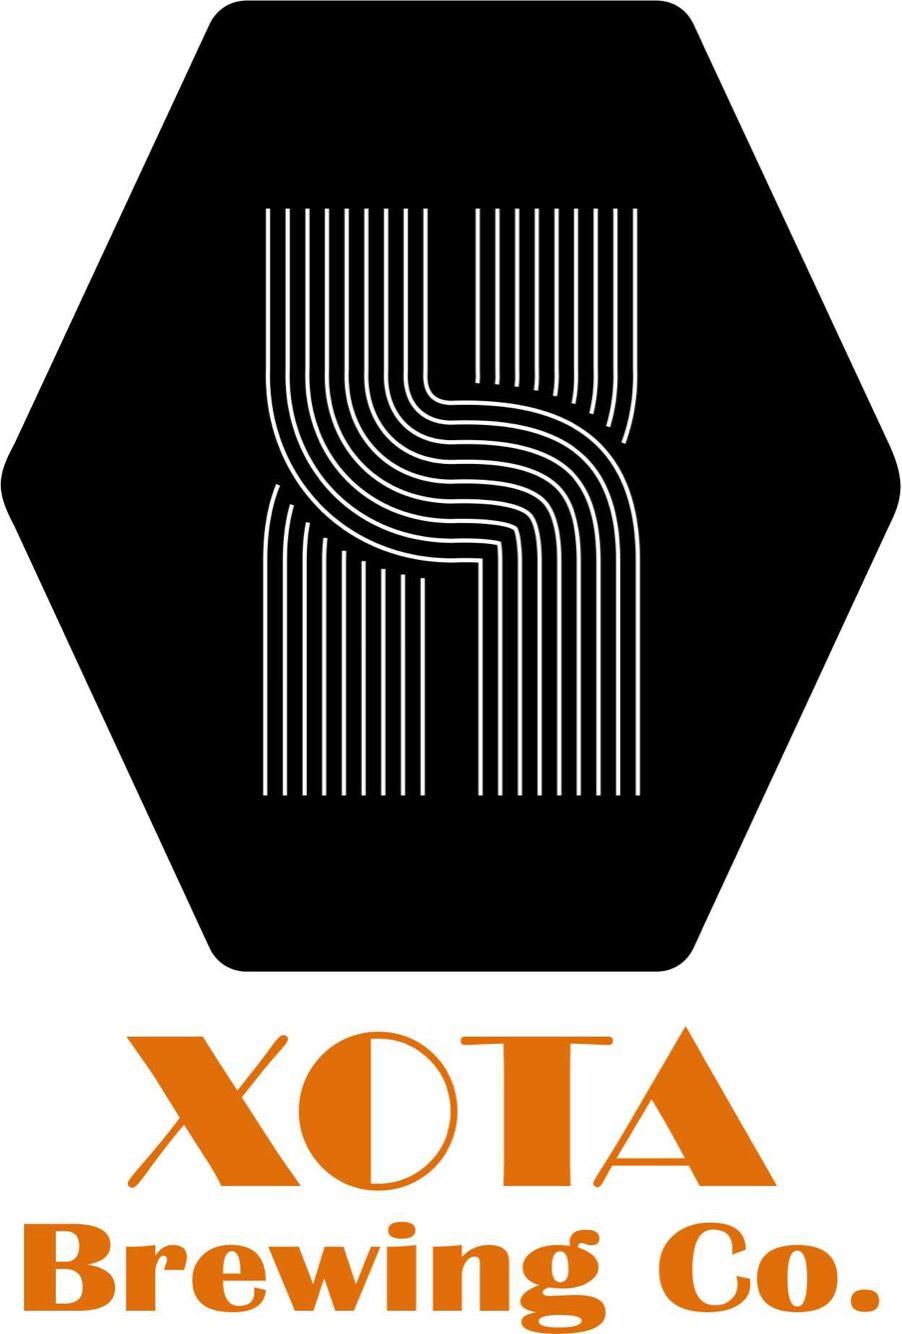 Xota Brewing